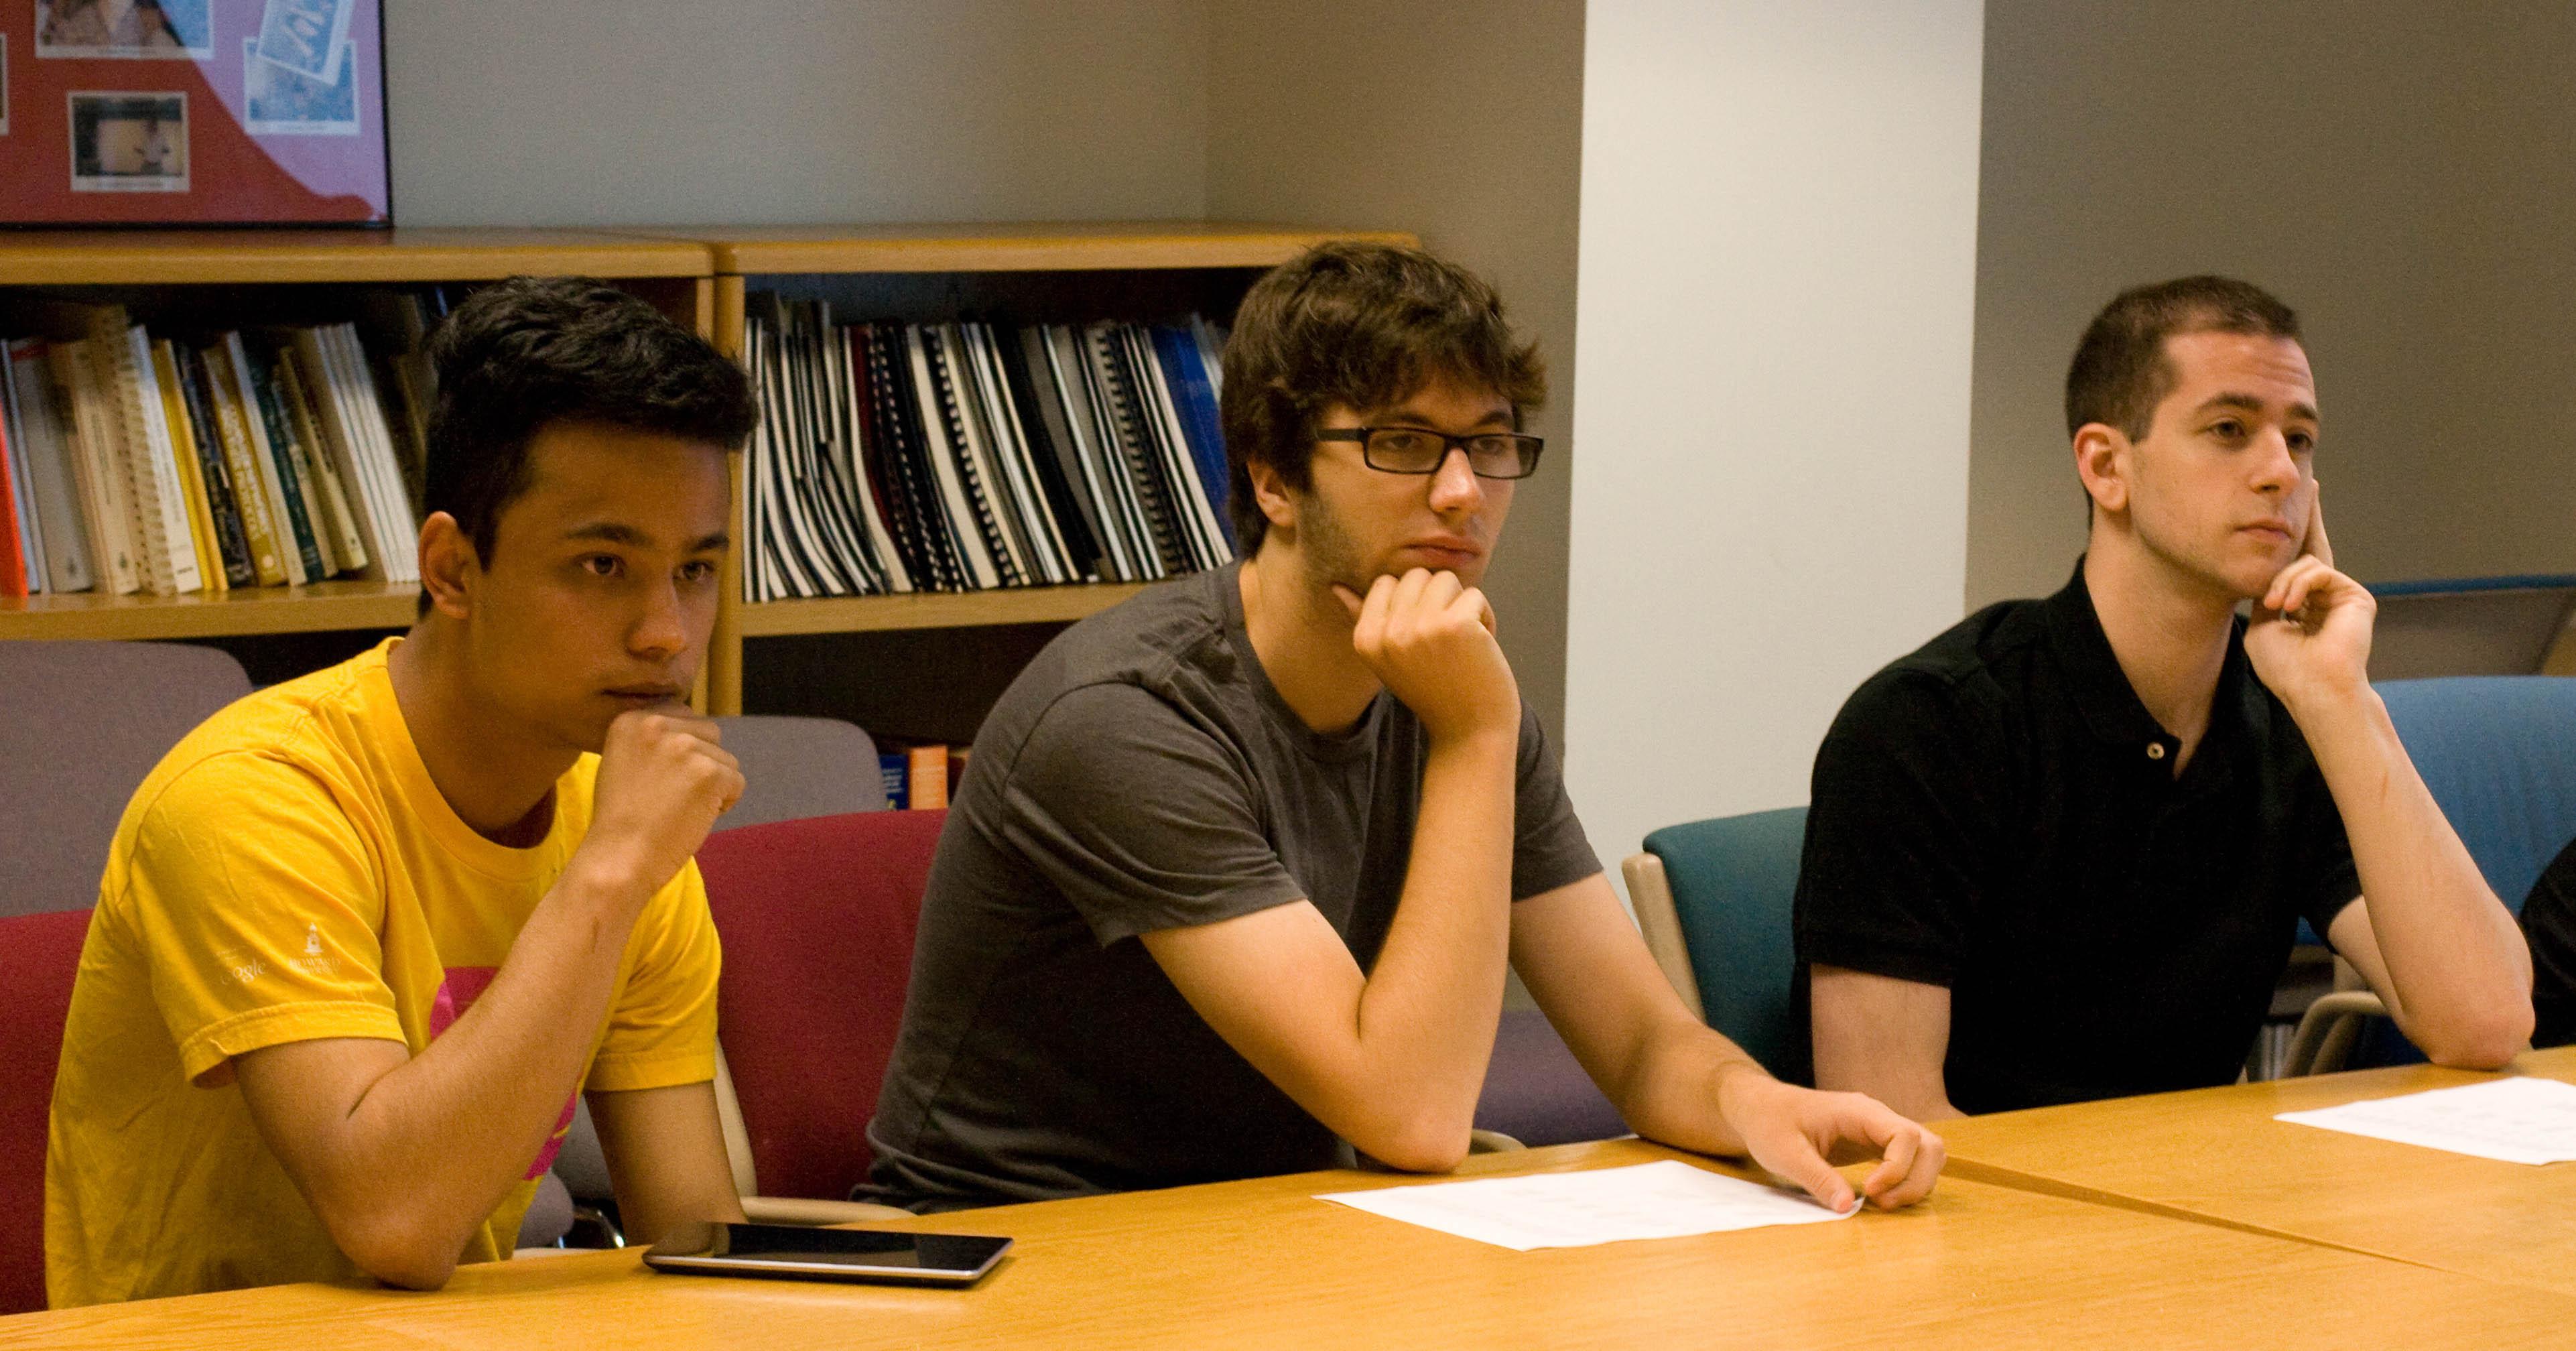 REU students Roshan       Thapaliya (left), Jacob McNamara (center), and Leo Behe (right).